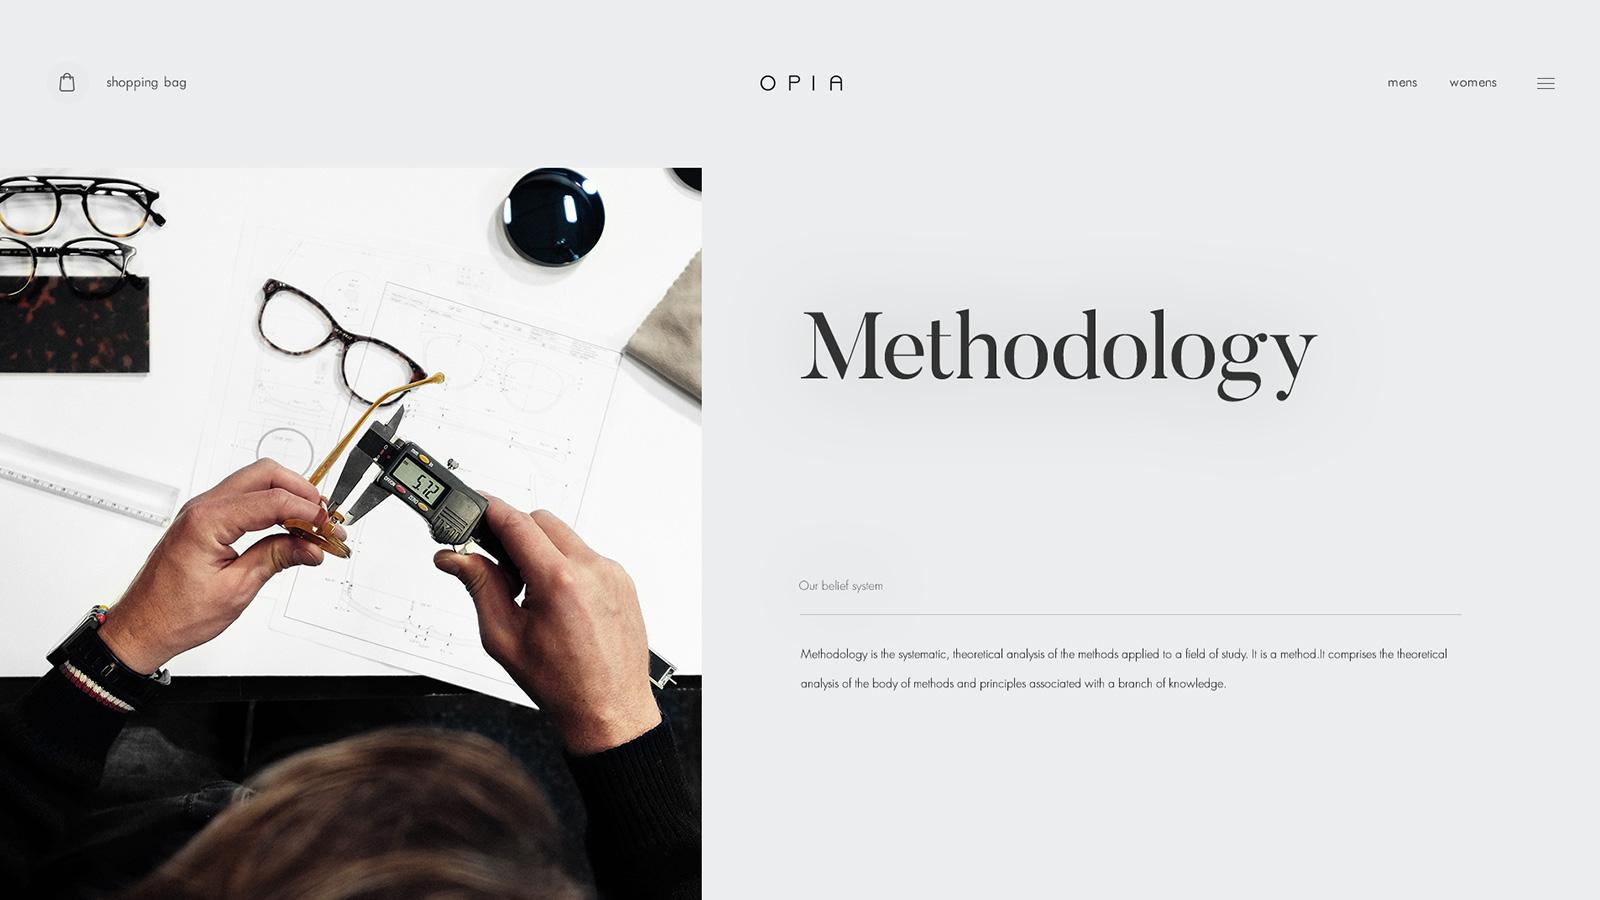 004-opia.jpg